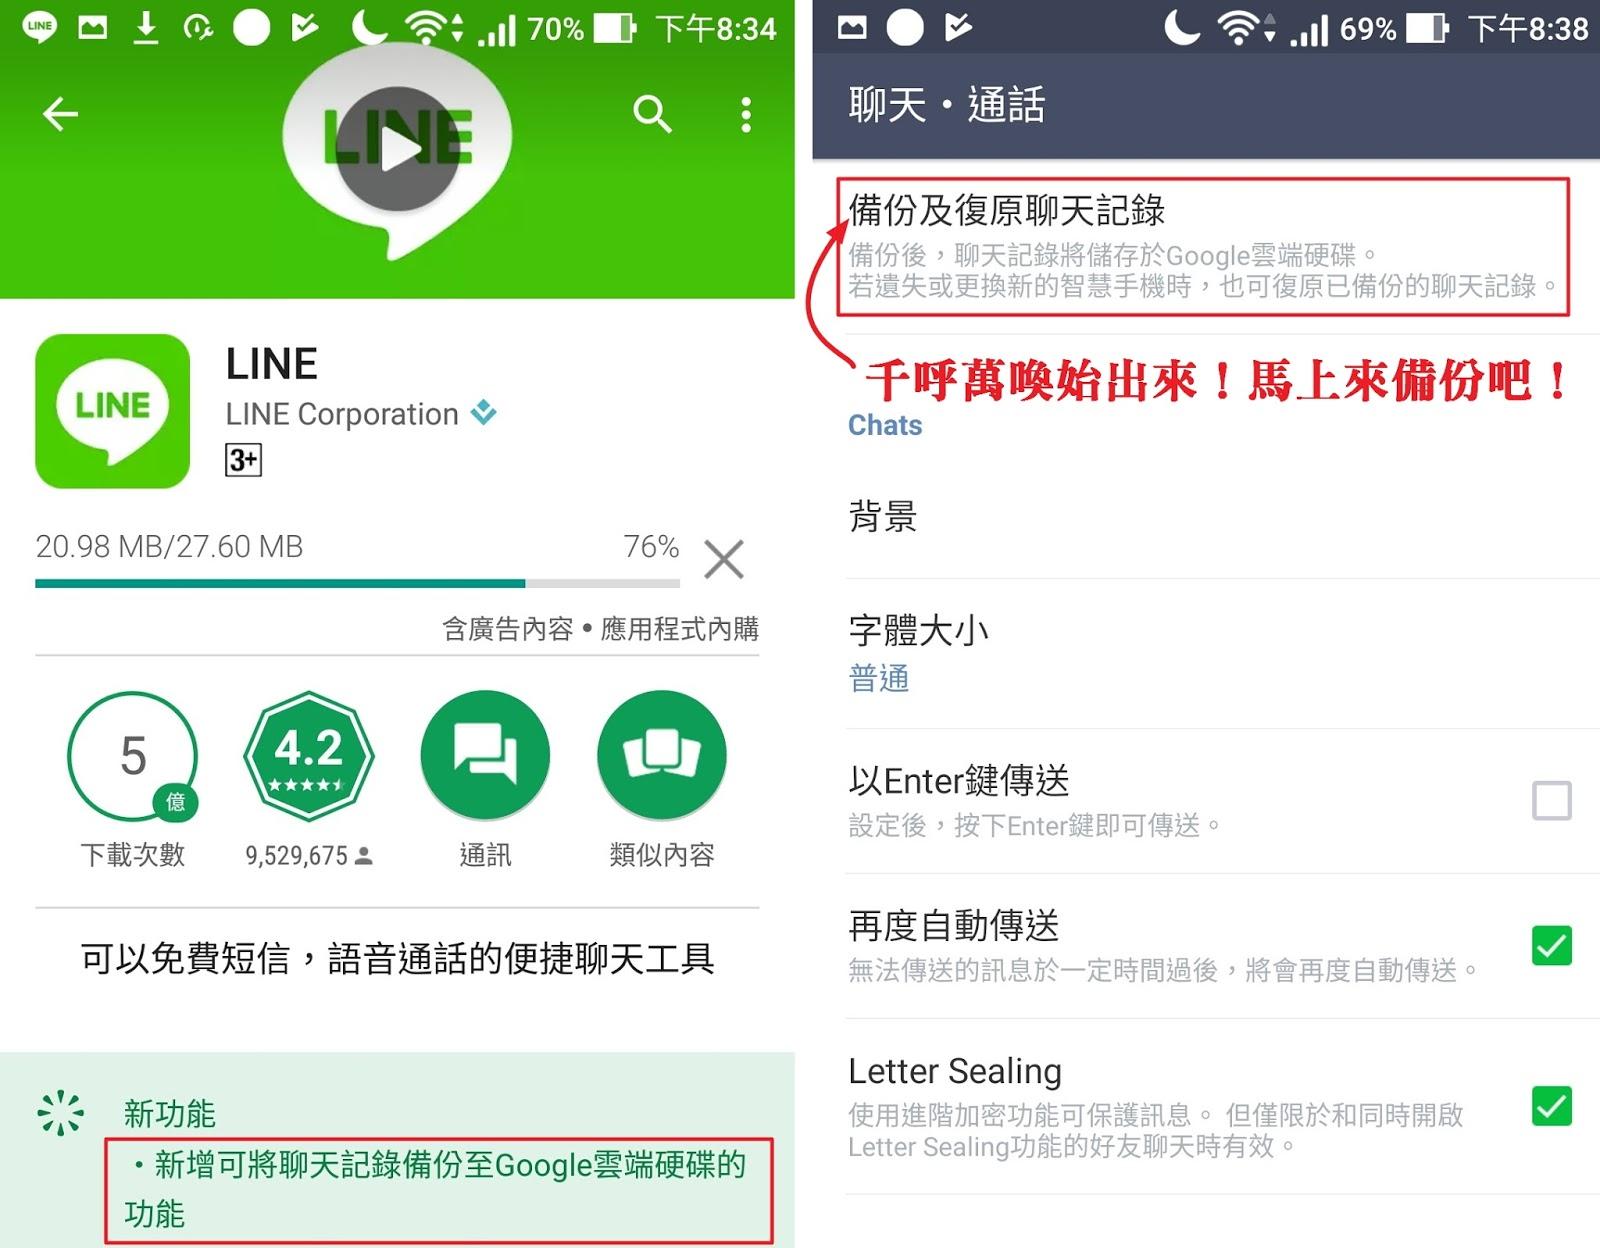 Screenshot 20170531 203433 - [教學] Line 終於開放 Android 使用者「雲端備份」聊天紀錄!趕快來更新吧!